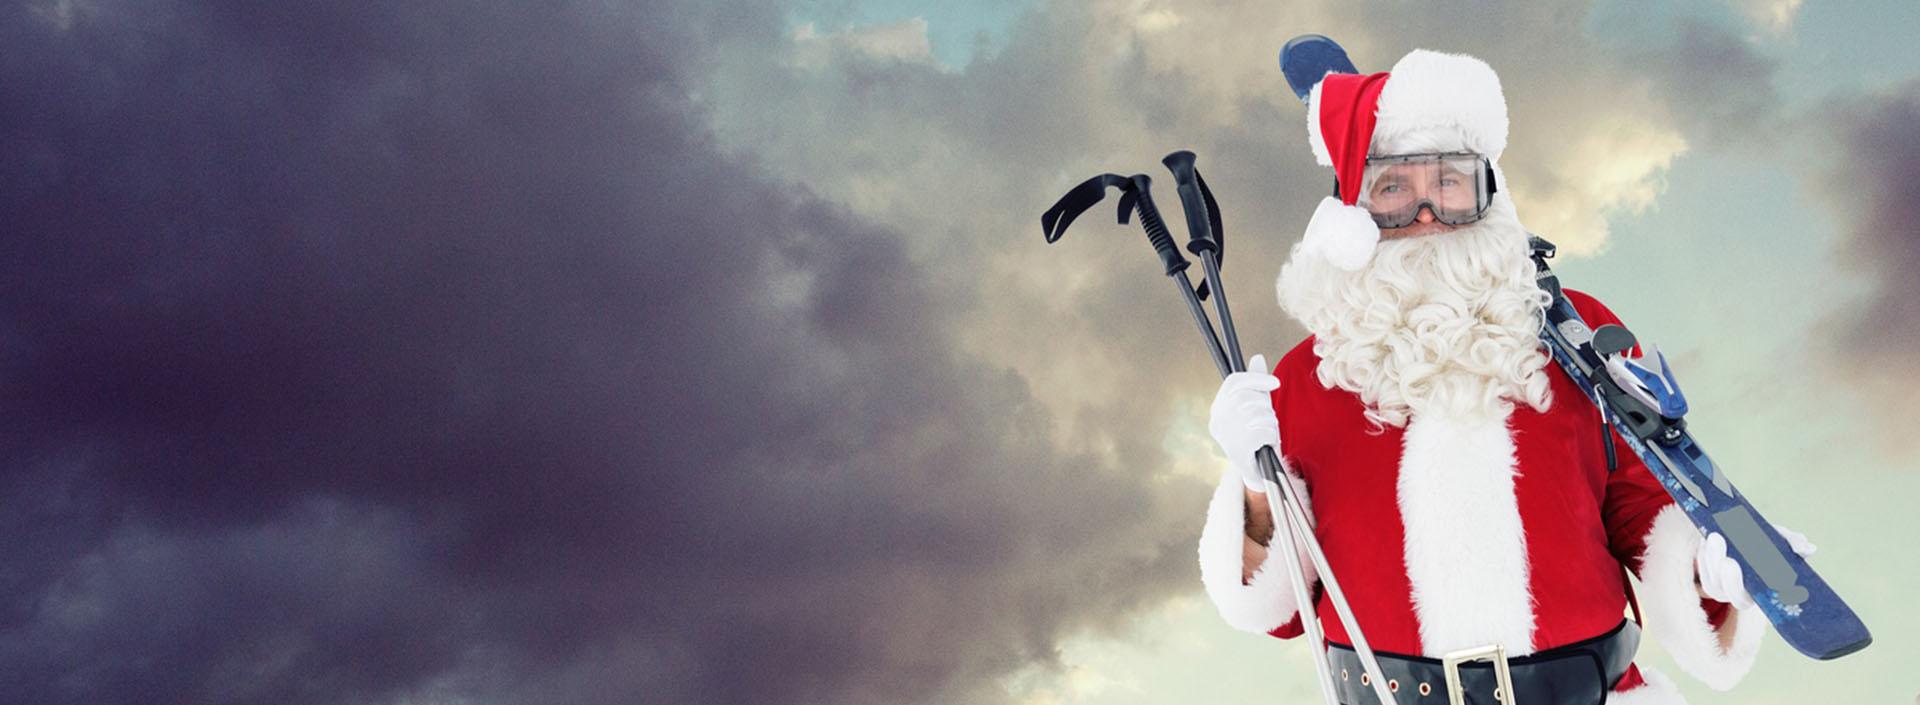 mikołaj na nartach